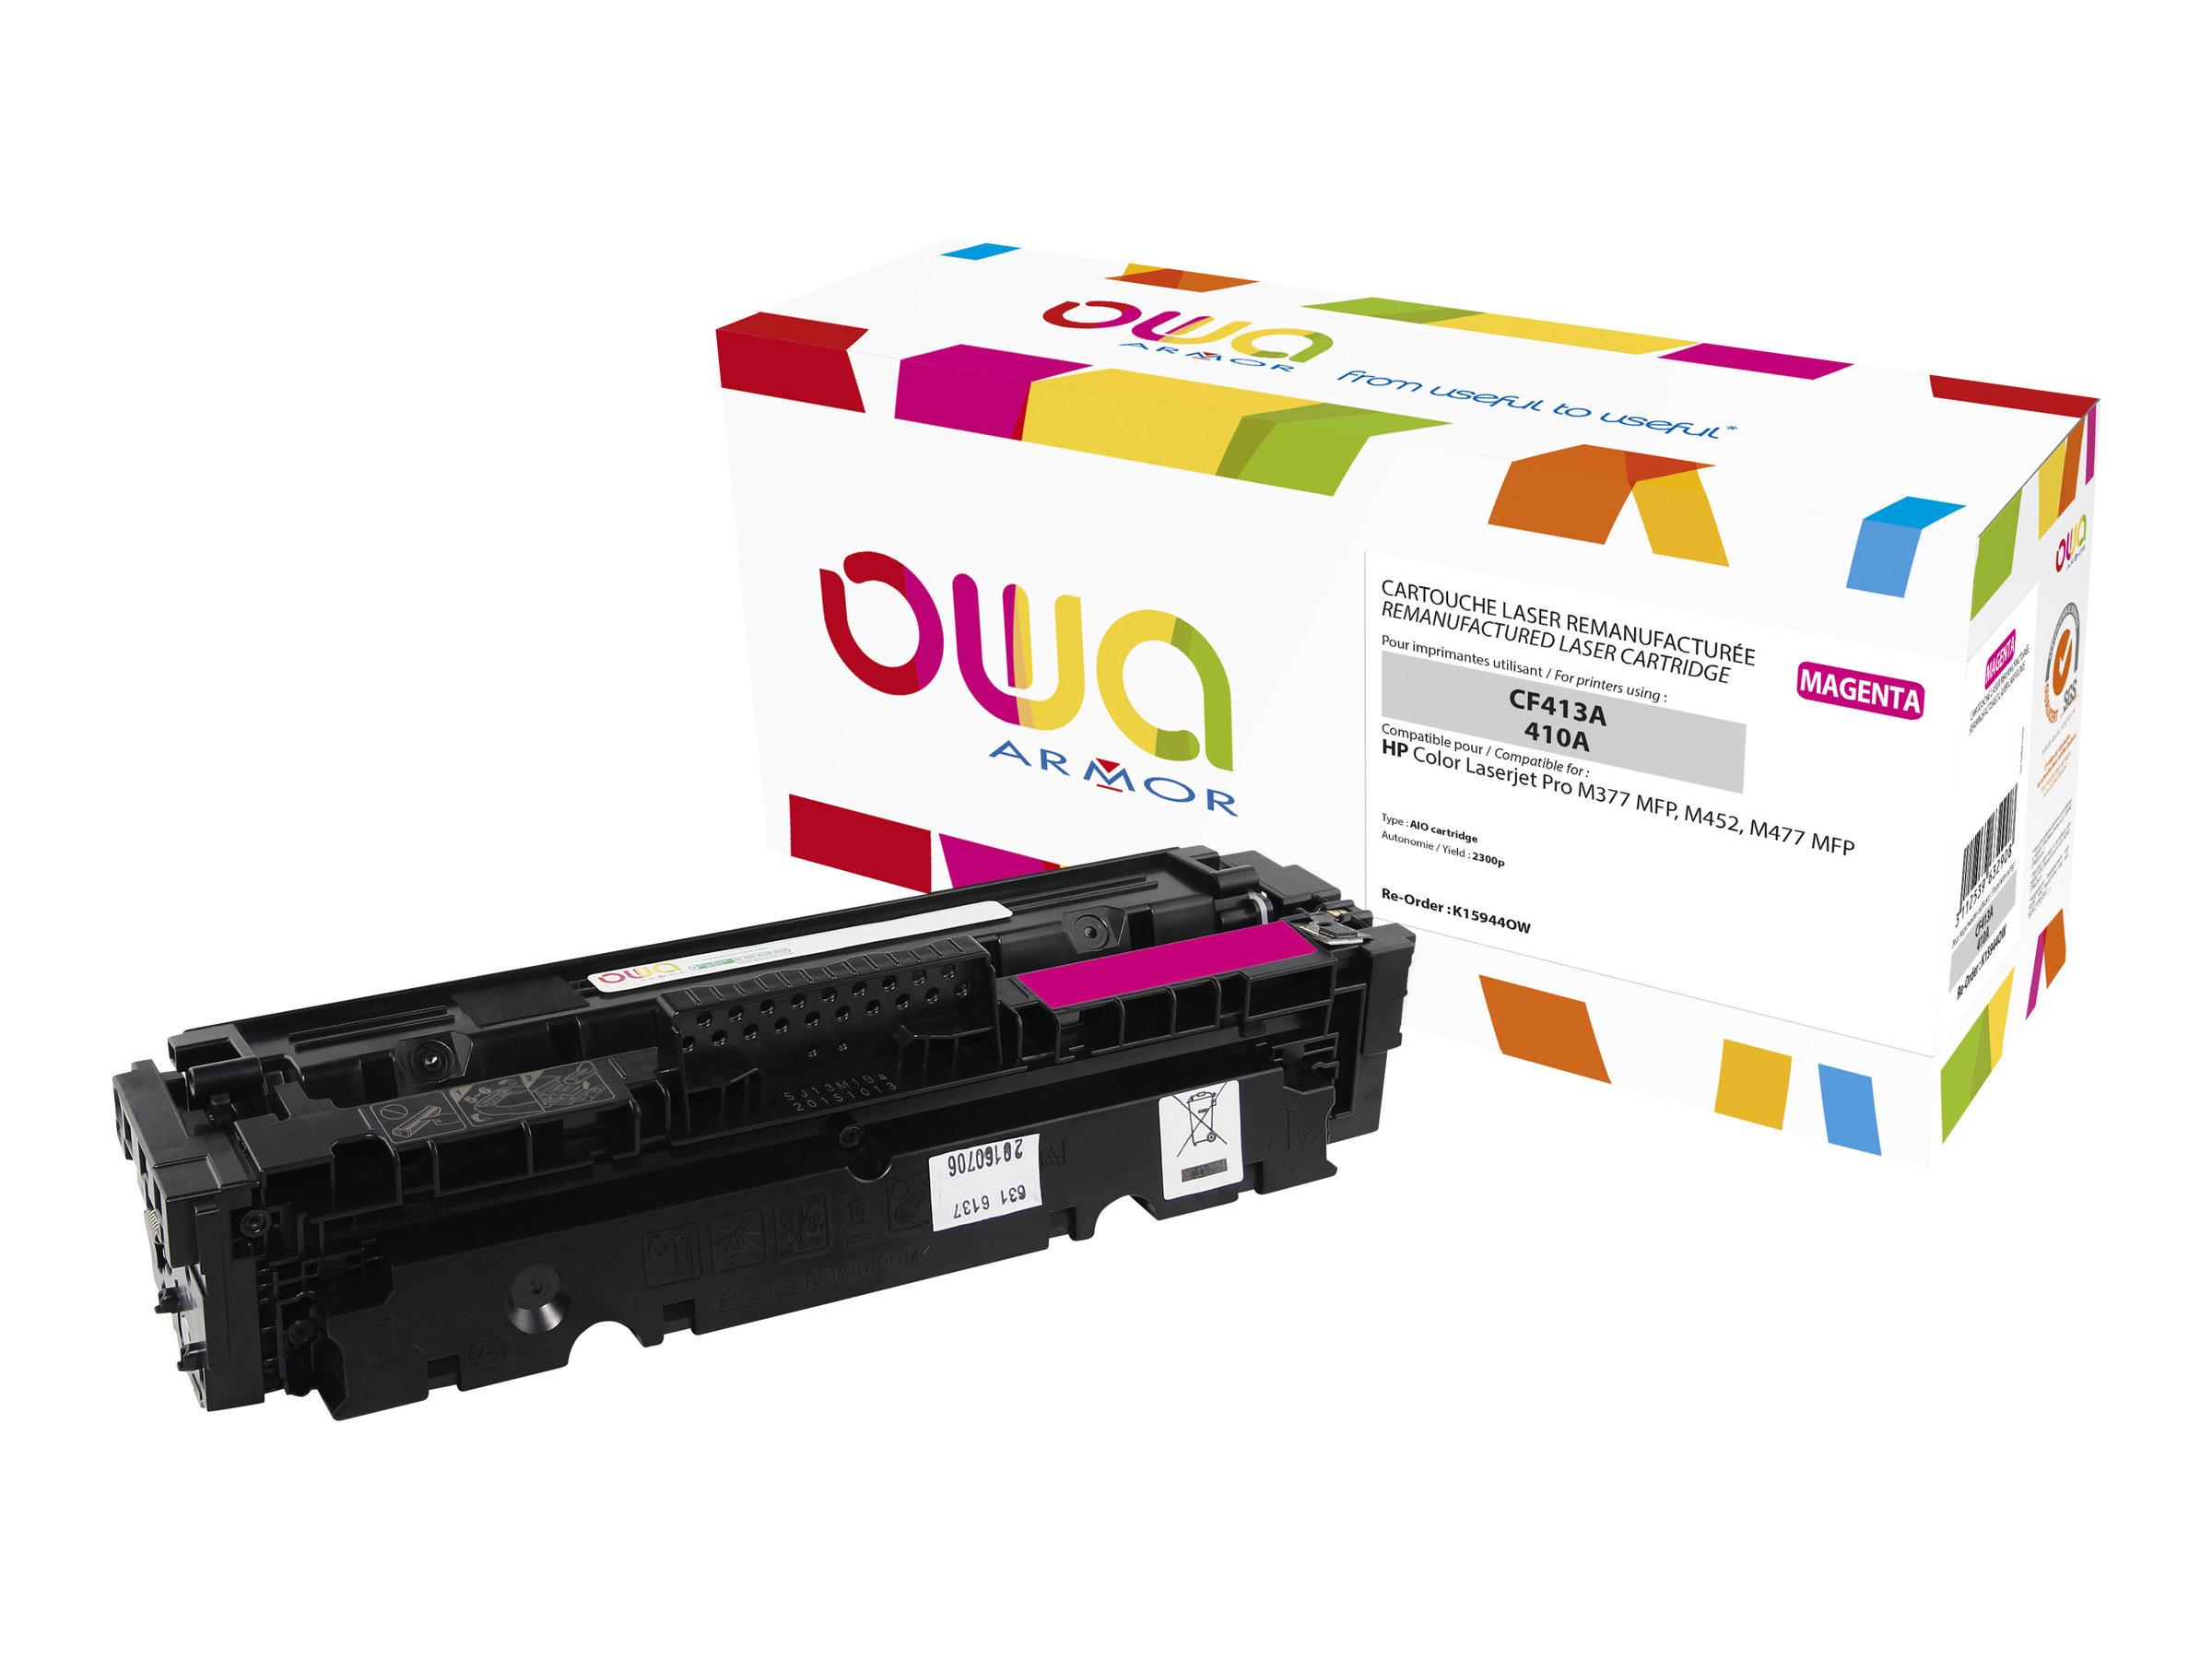 HP 410A - remanufacturé Owa K15944OW - magenta - cartouche laser